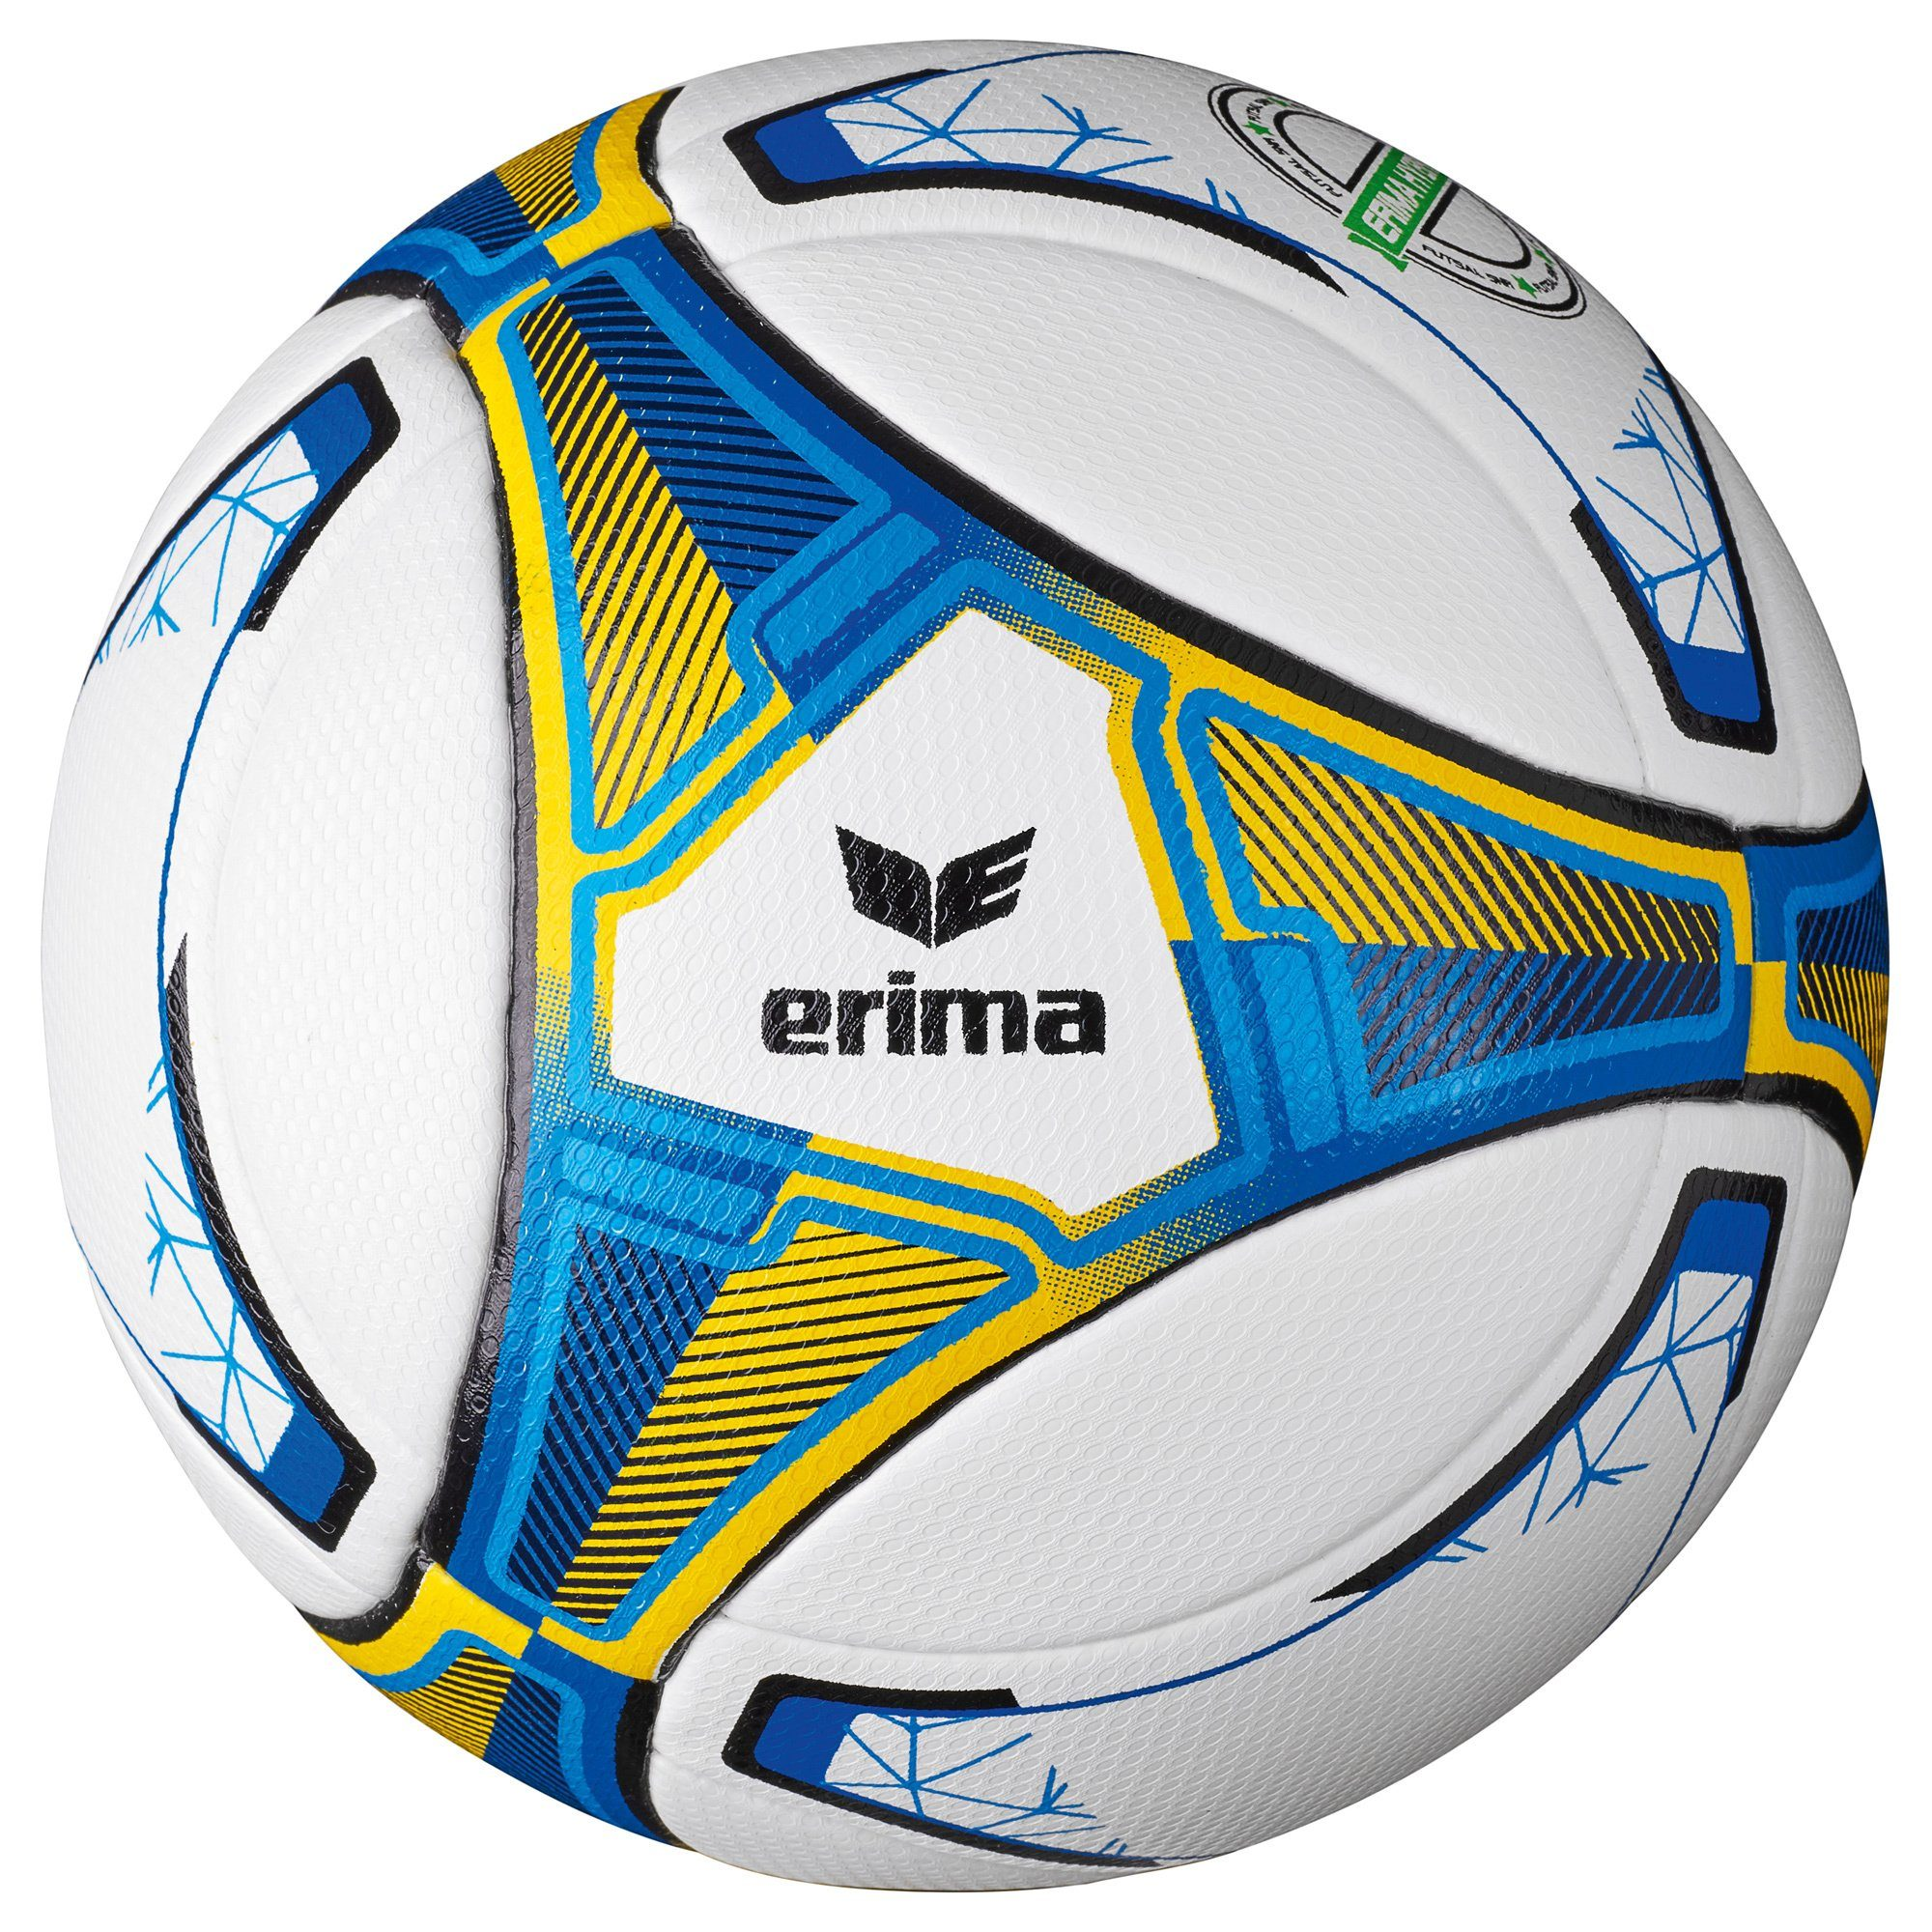 ERIMA Hybrid Futsal Senior Matchball